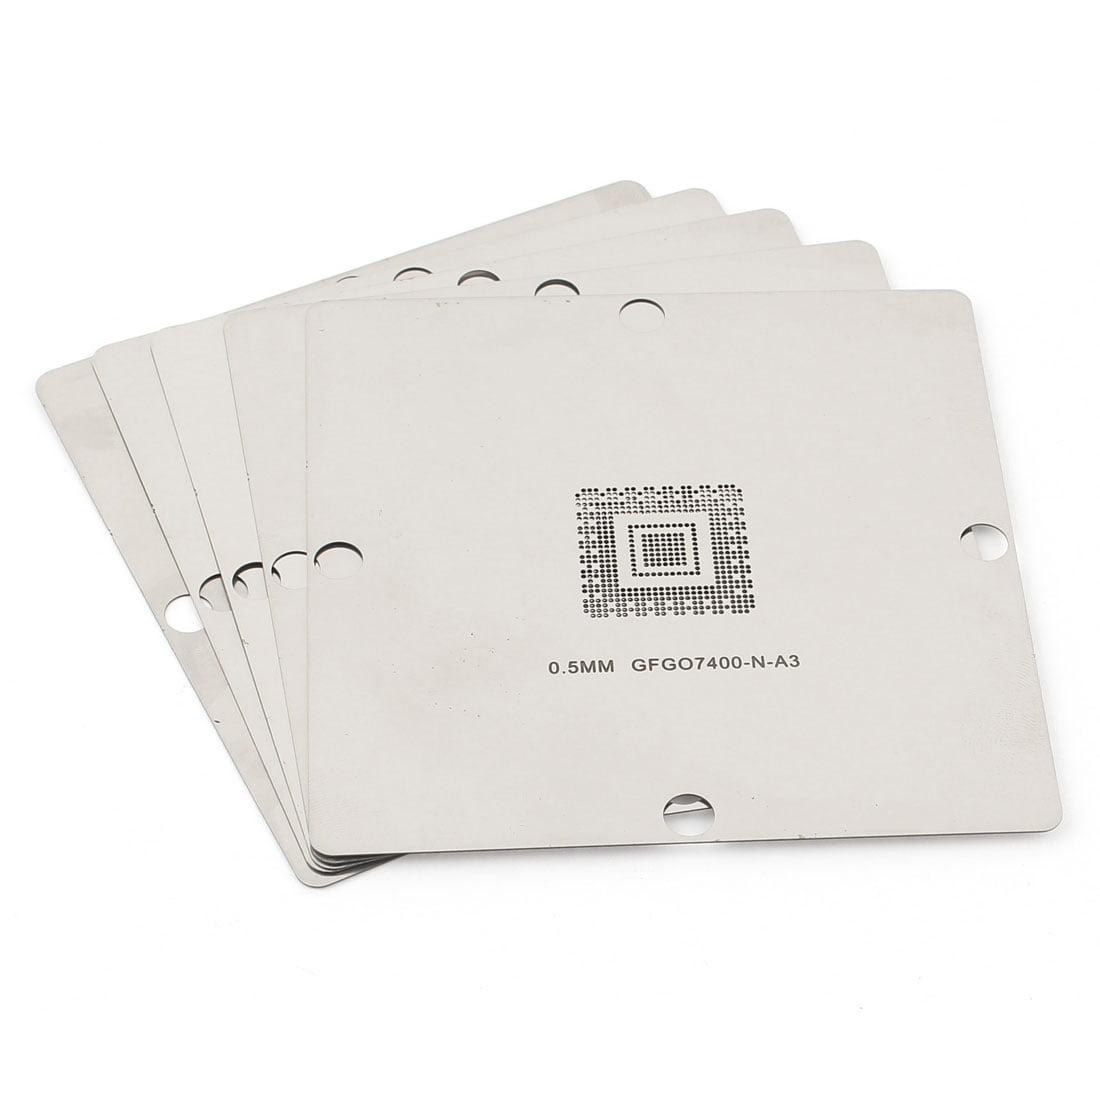 5pcs 90X90mm Rework BGA Reball Universal Stencil Template for GFGO7400-N-A3 by